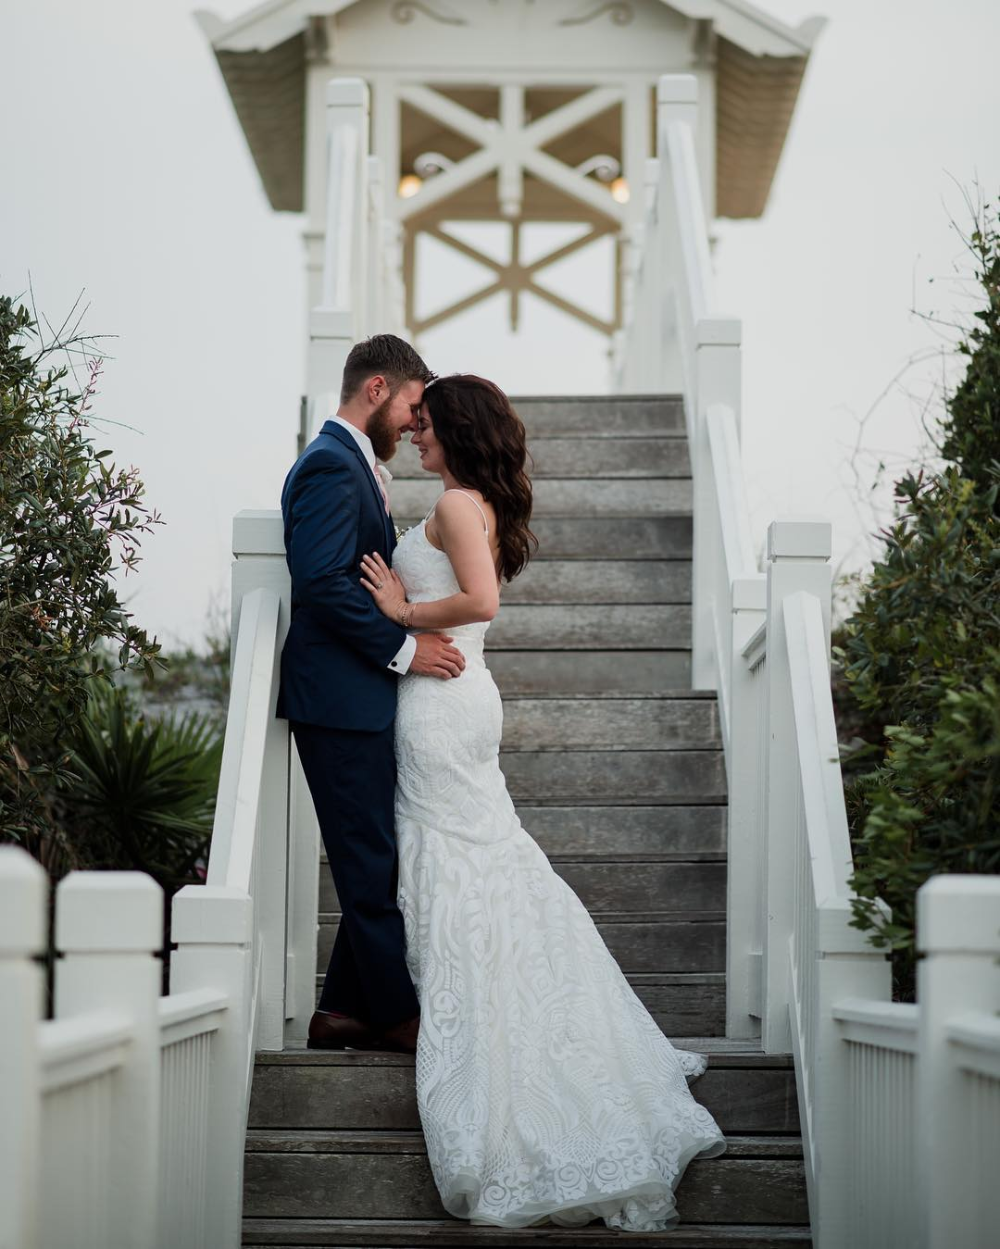 Carillon Beach Meeting House Wedding Film In 2020 Wedding Film Wedding Carillon Beach